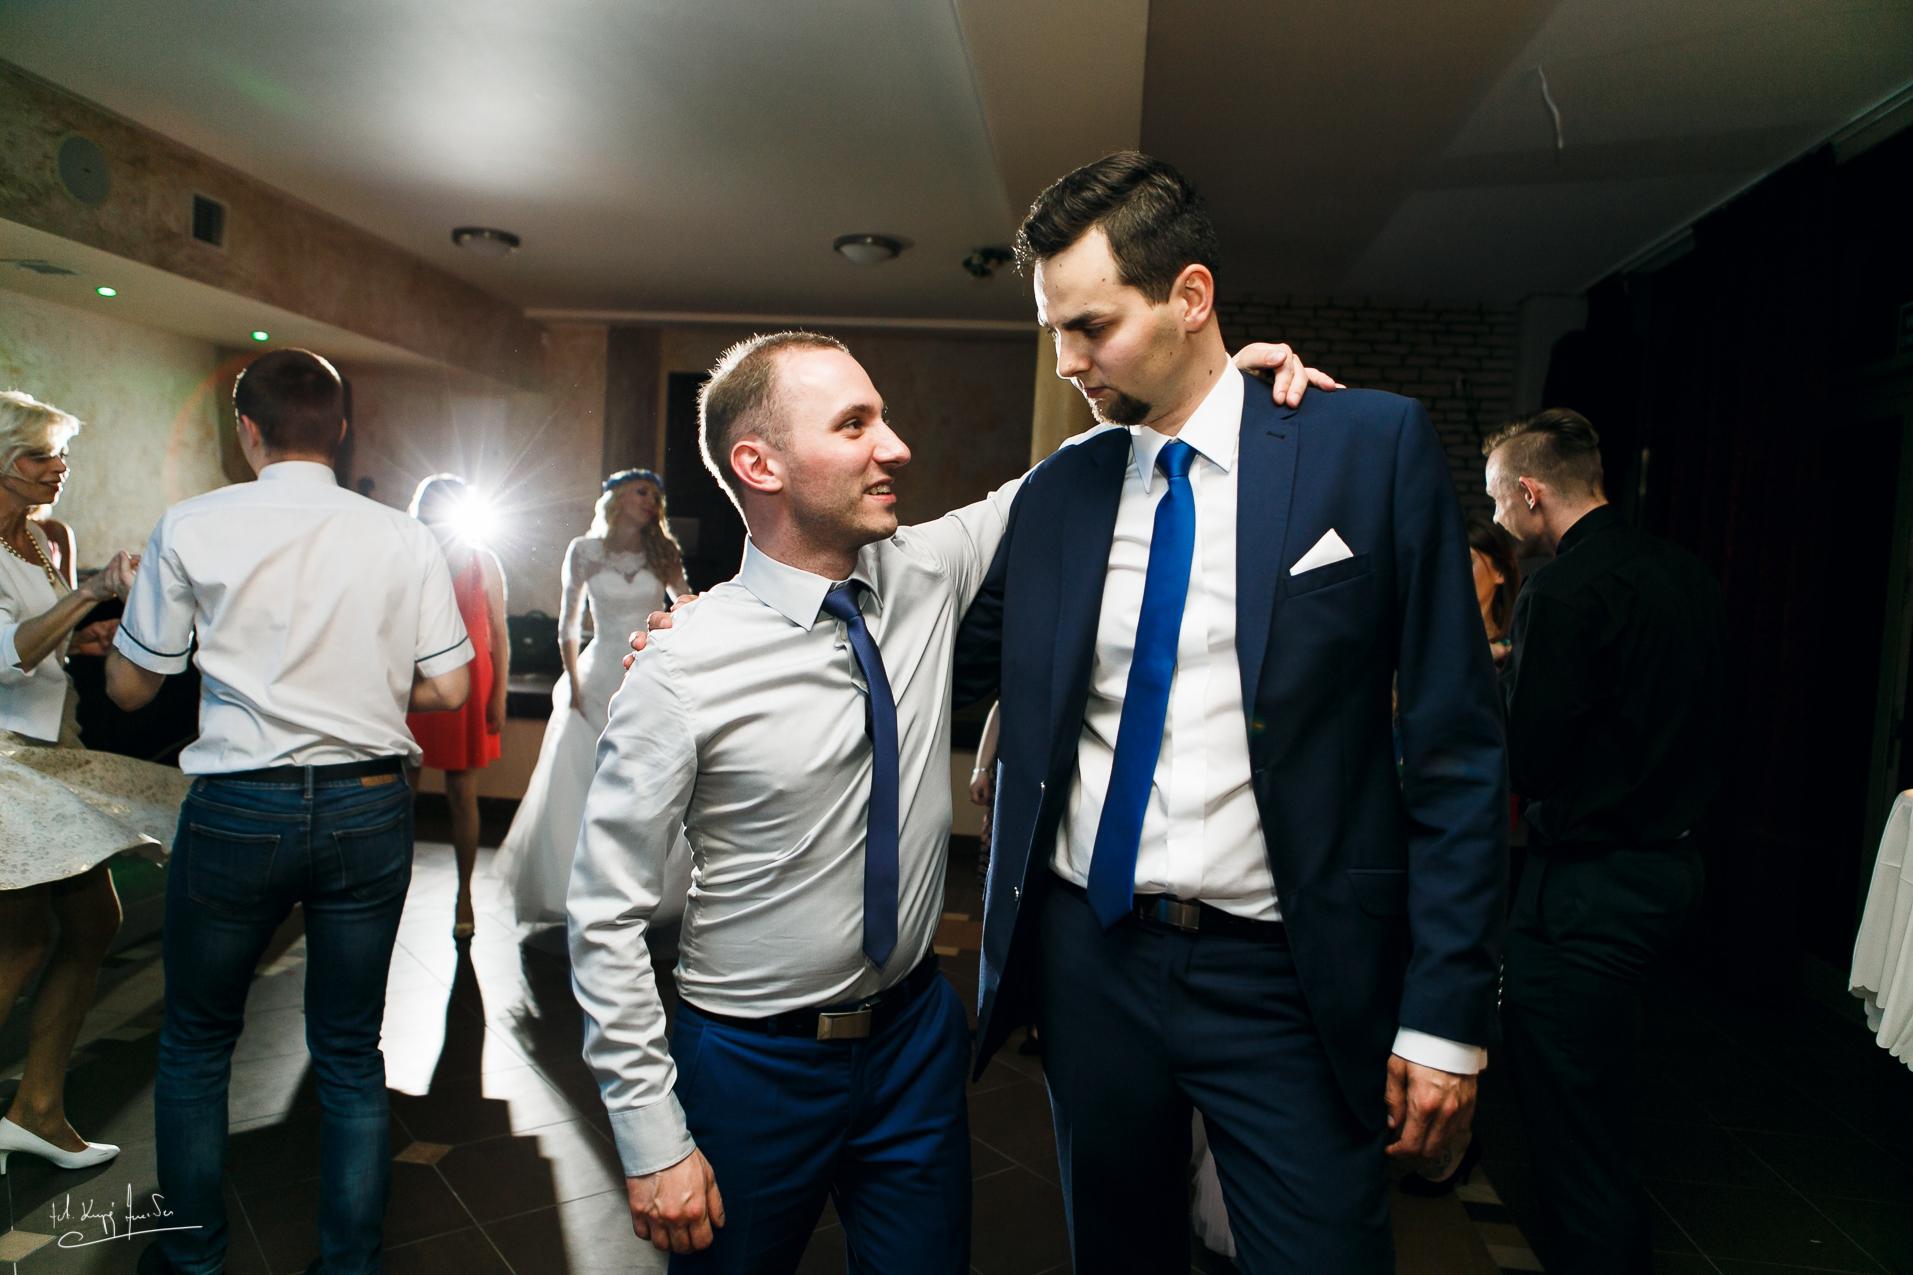 Ślub wesele szklarska poręba 37 Marta & Sławek